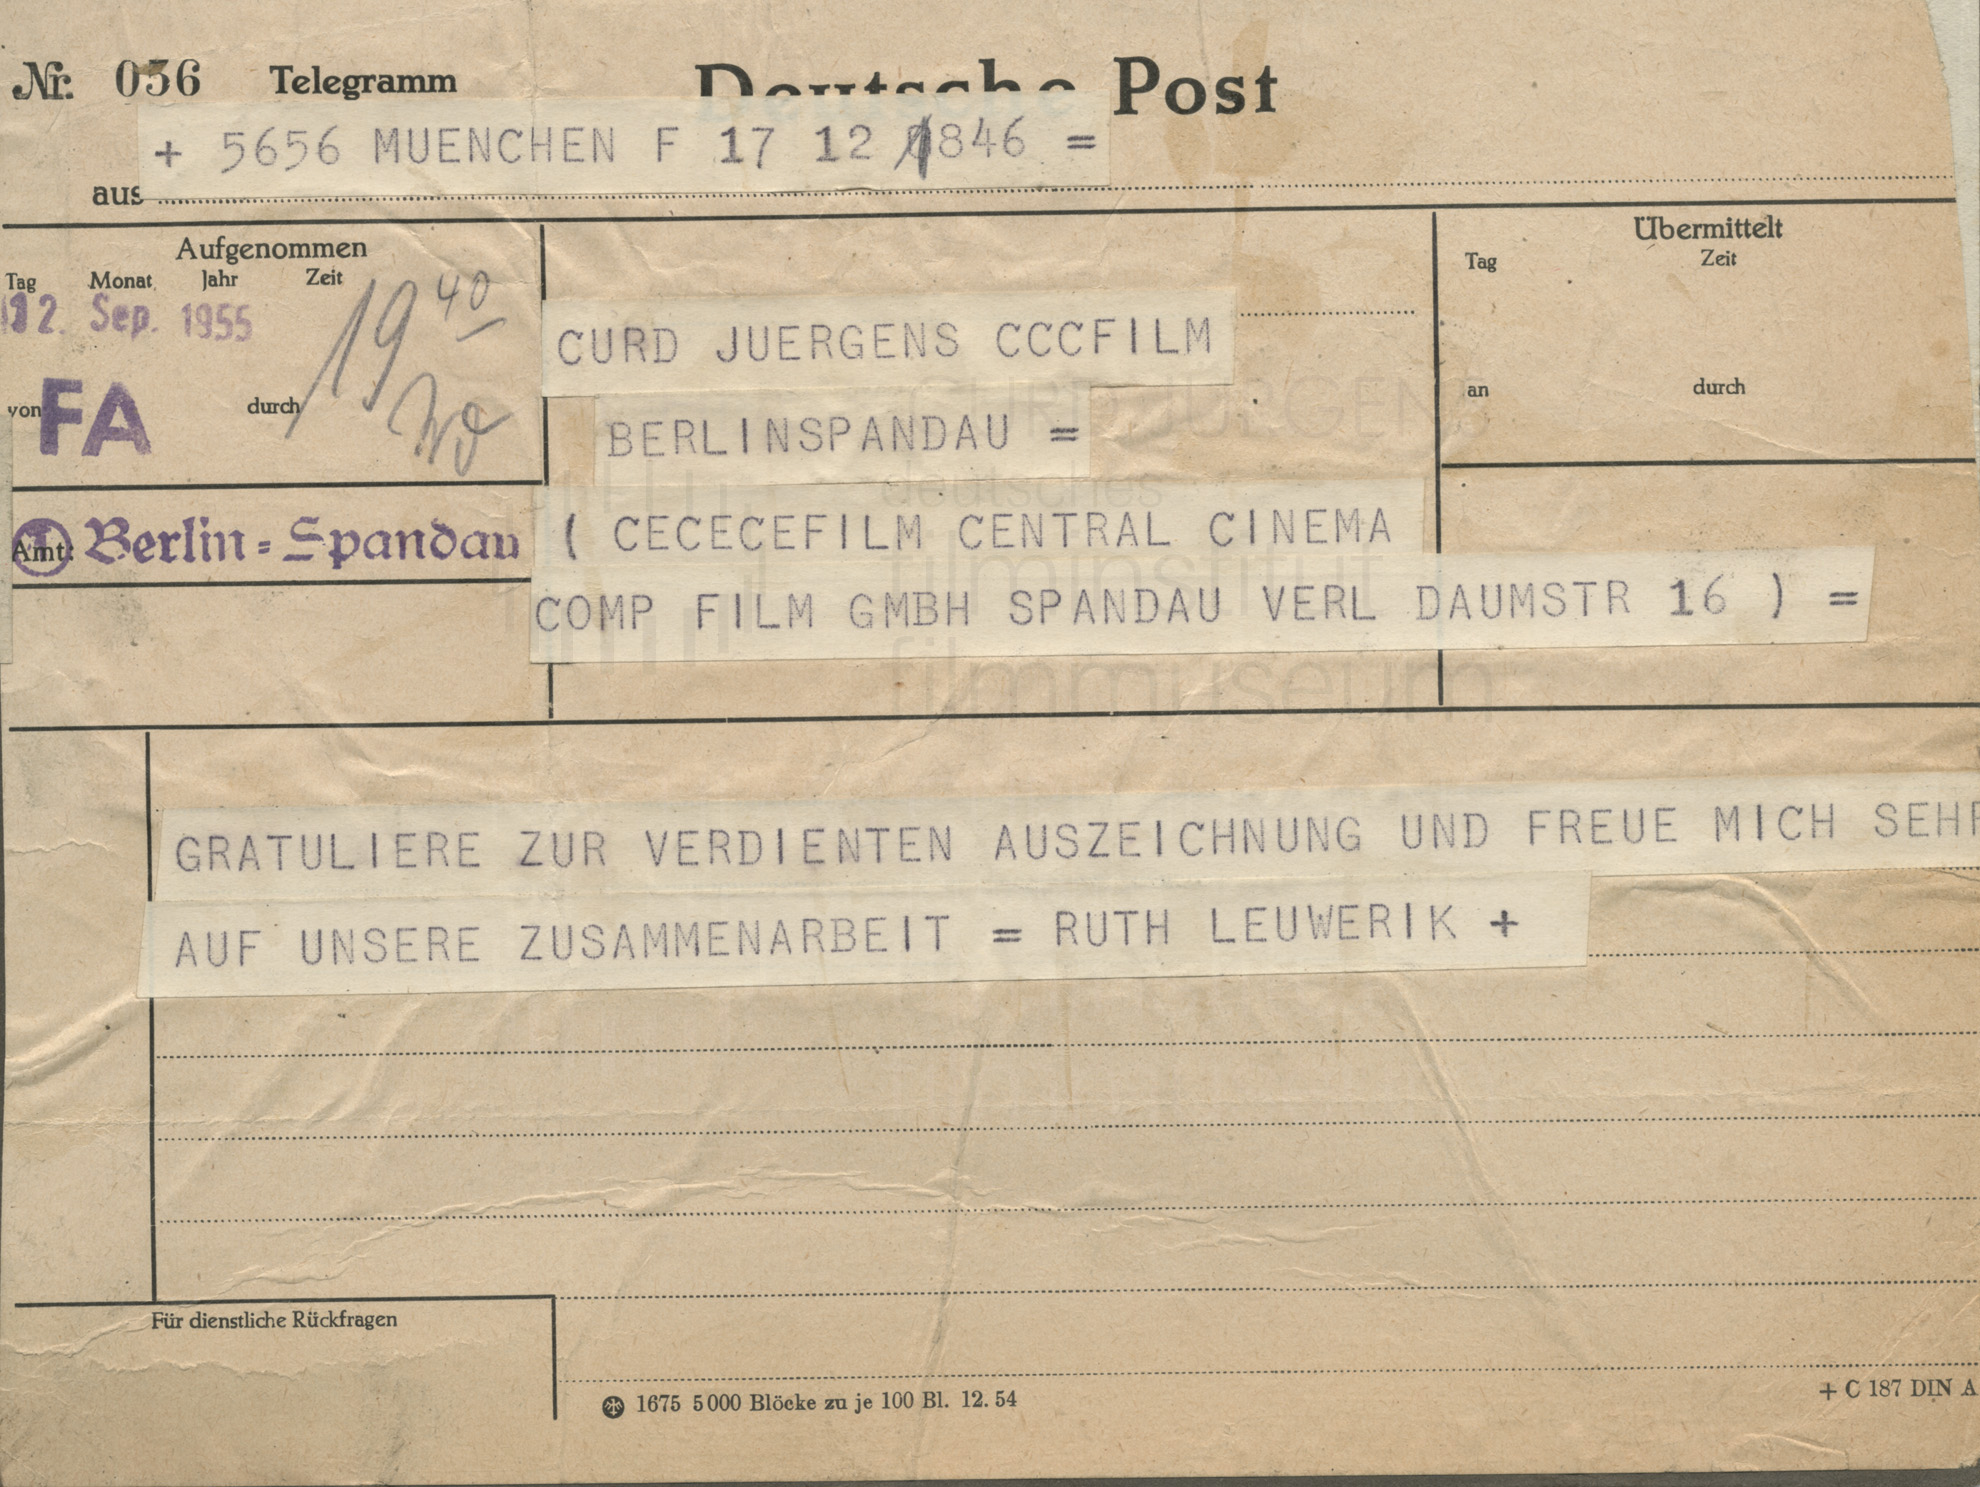 Ruth Leuwerik an Curd Jürgens. München, 12.9.1955